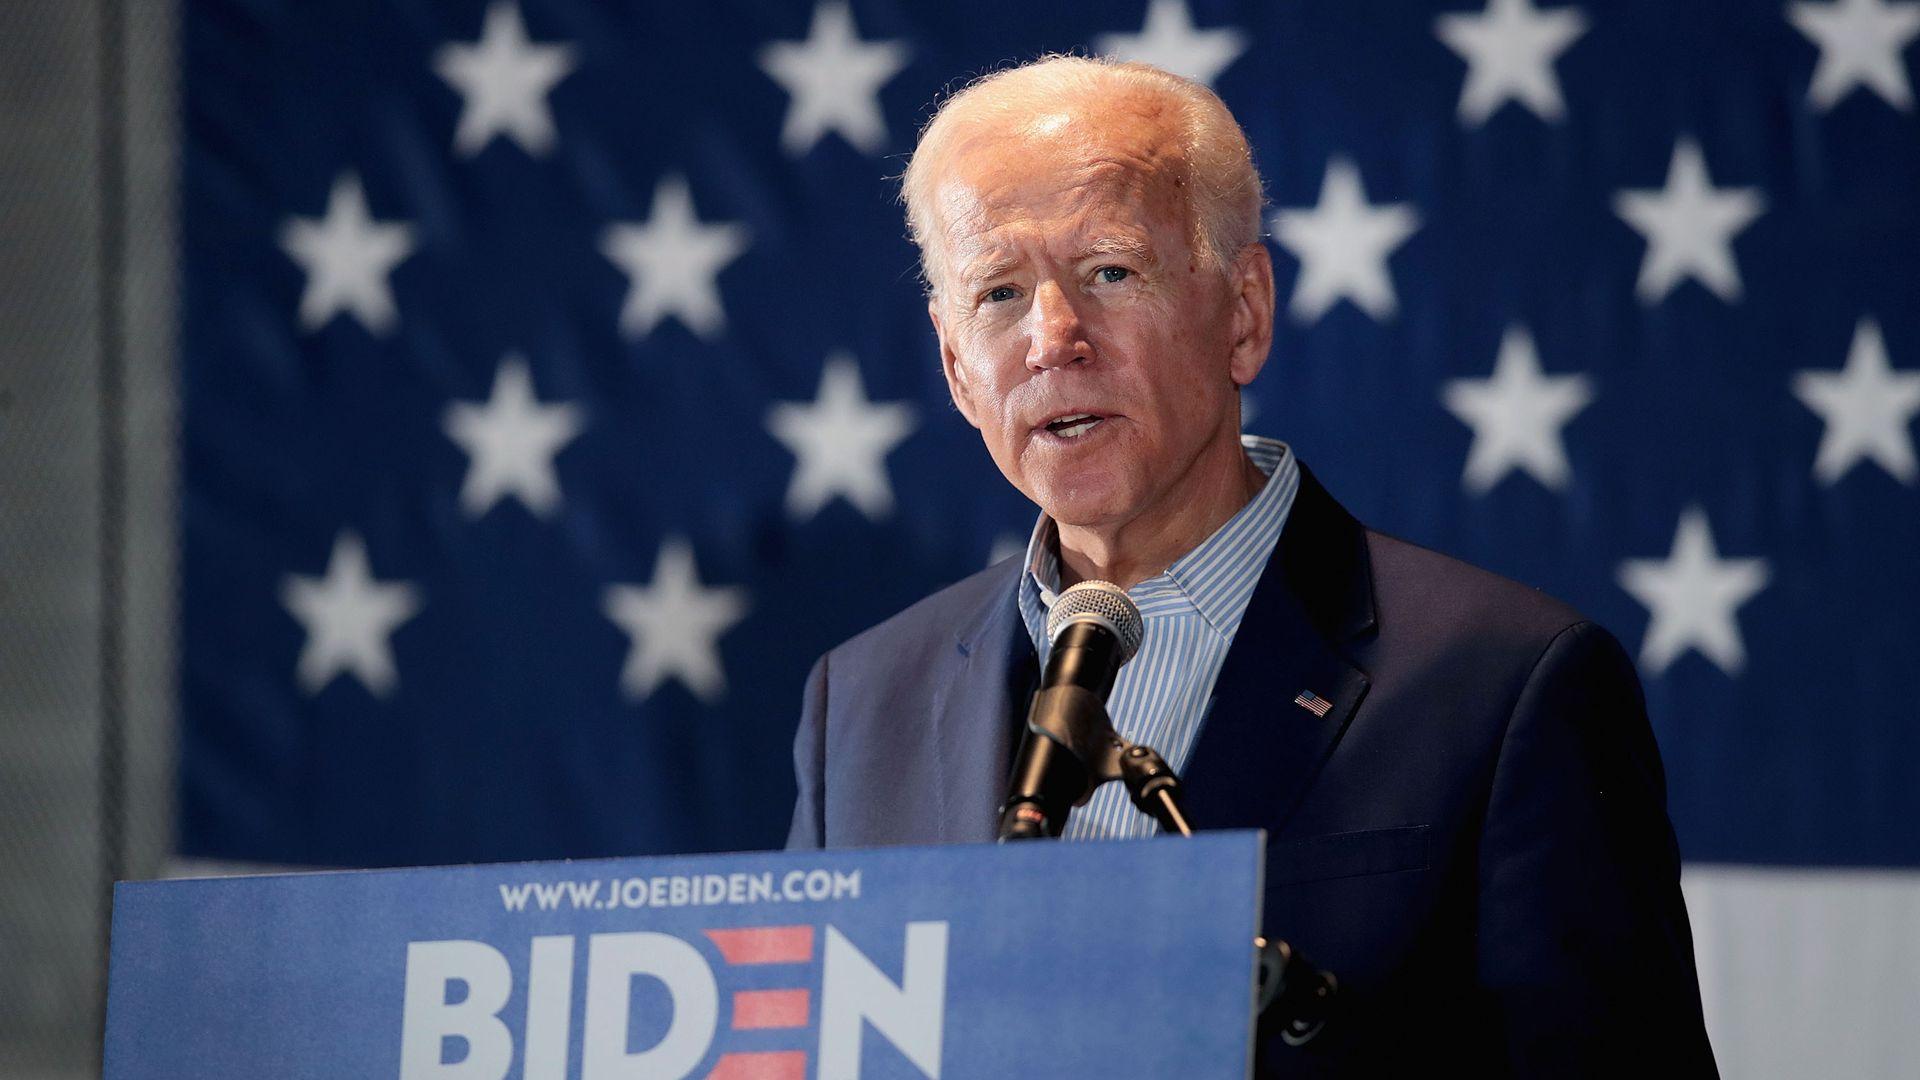 Former vice president turned 2020 presidential candidate Joe Biden